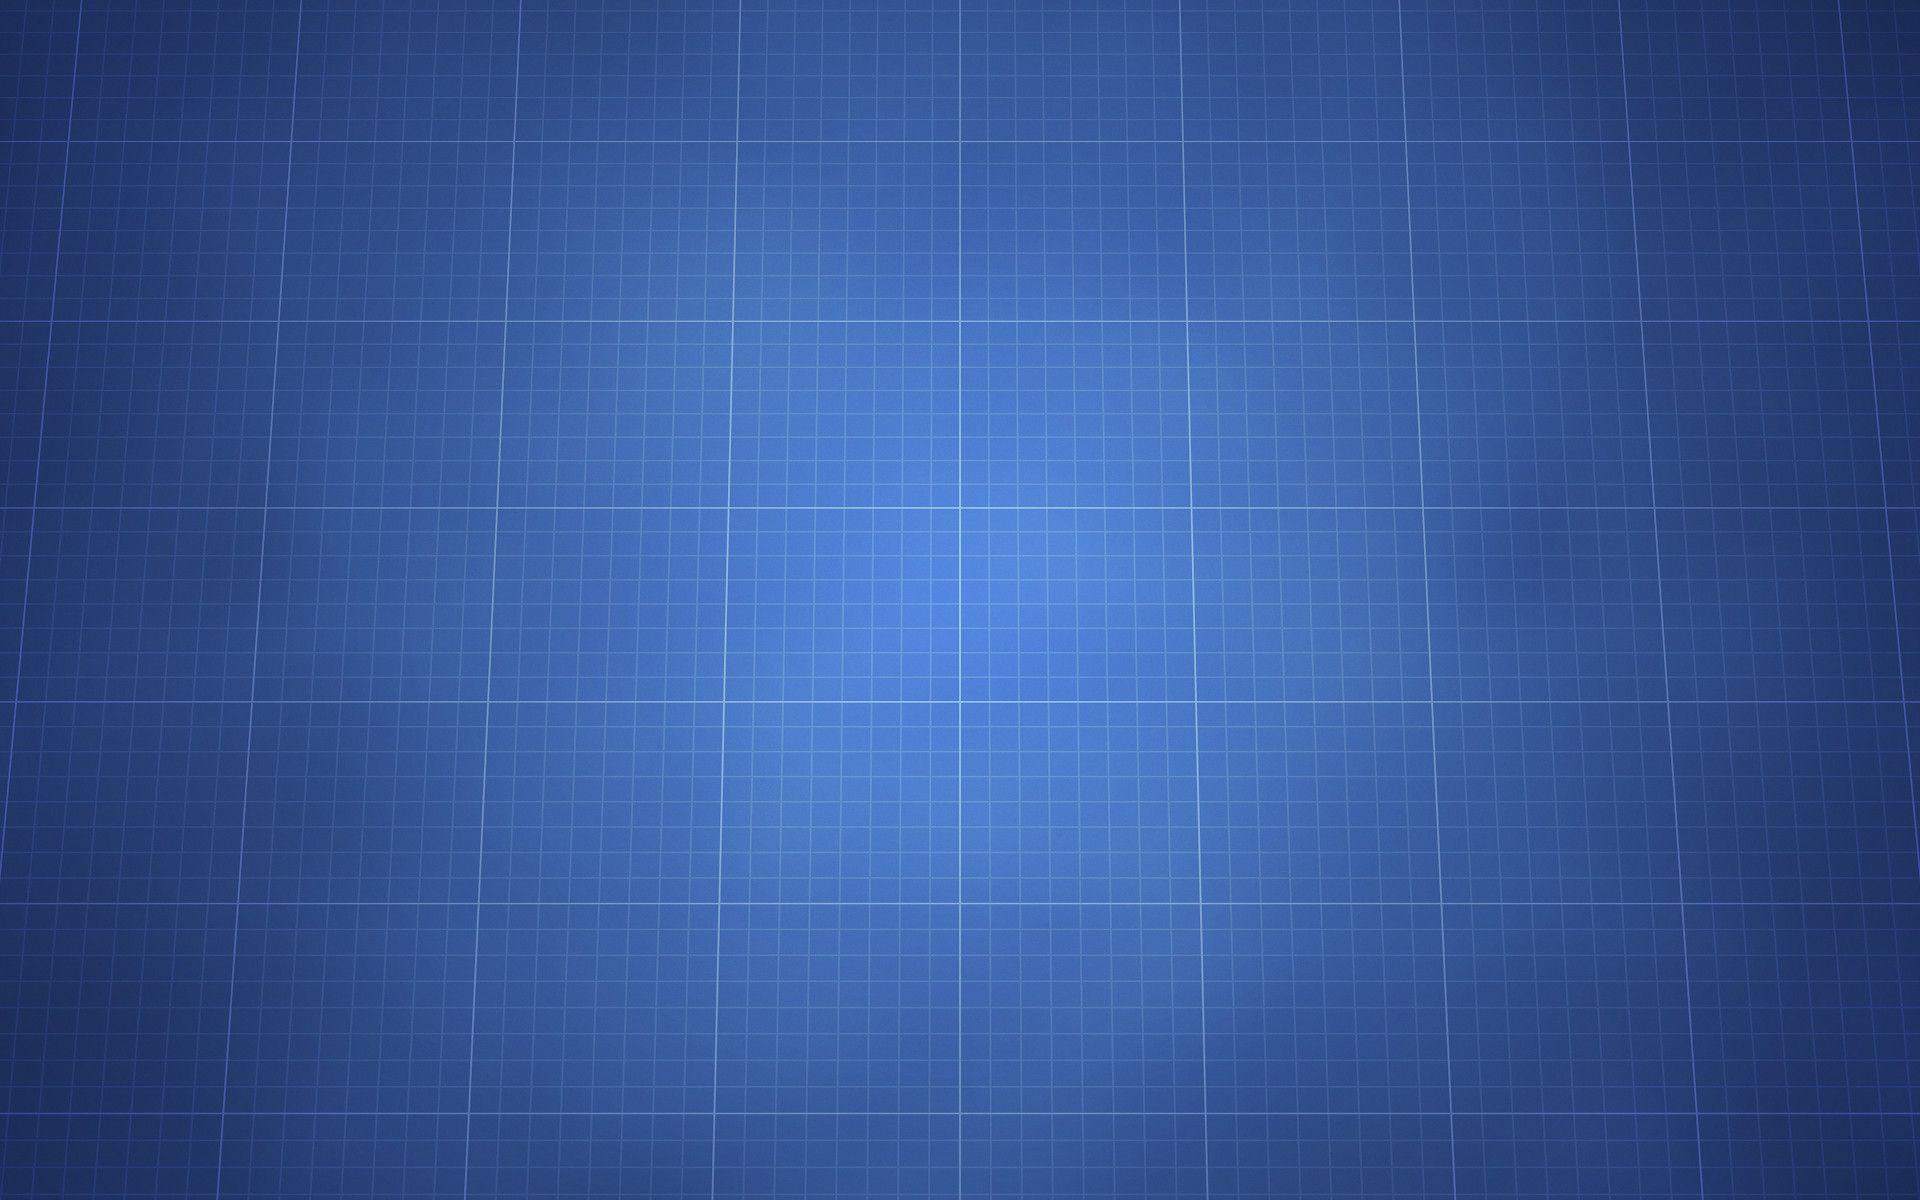 Blank Light Blue Background 60620 Arkpaint